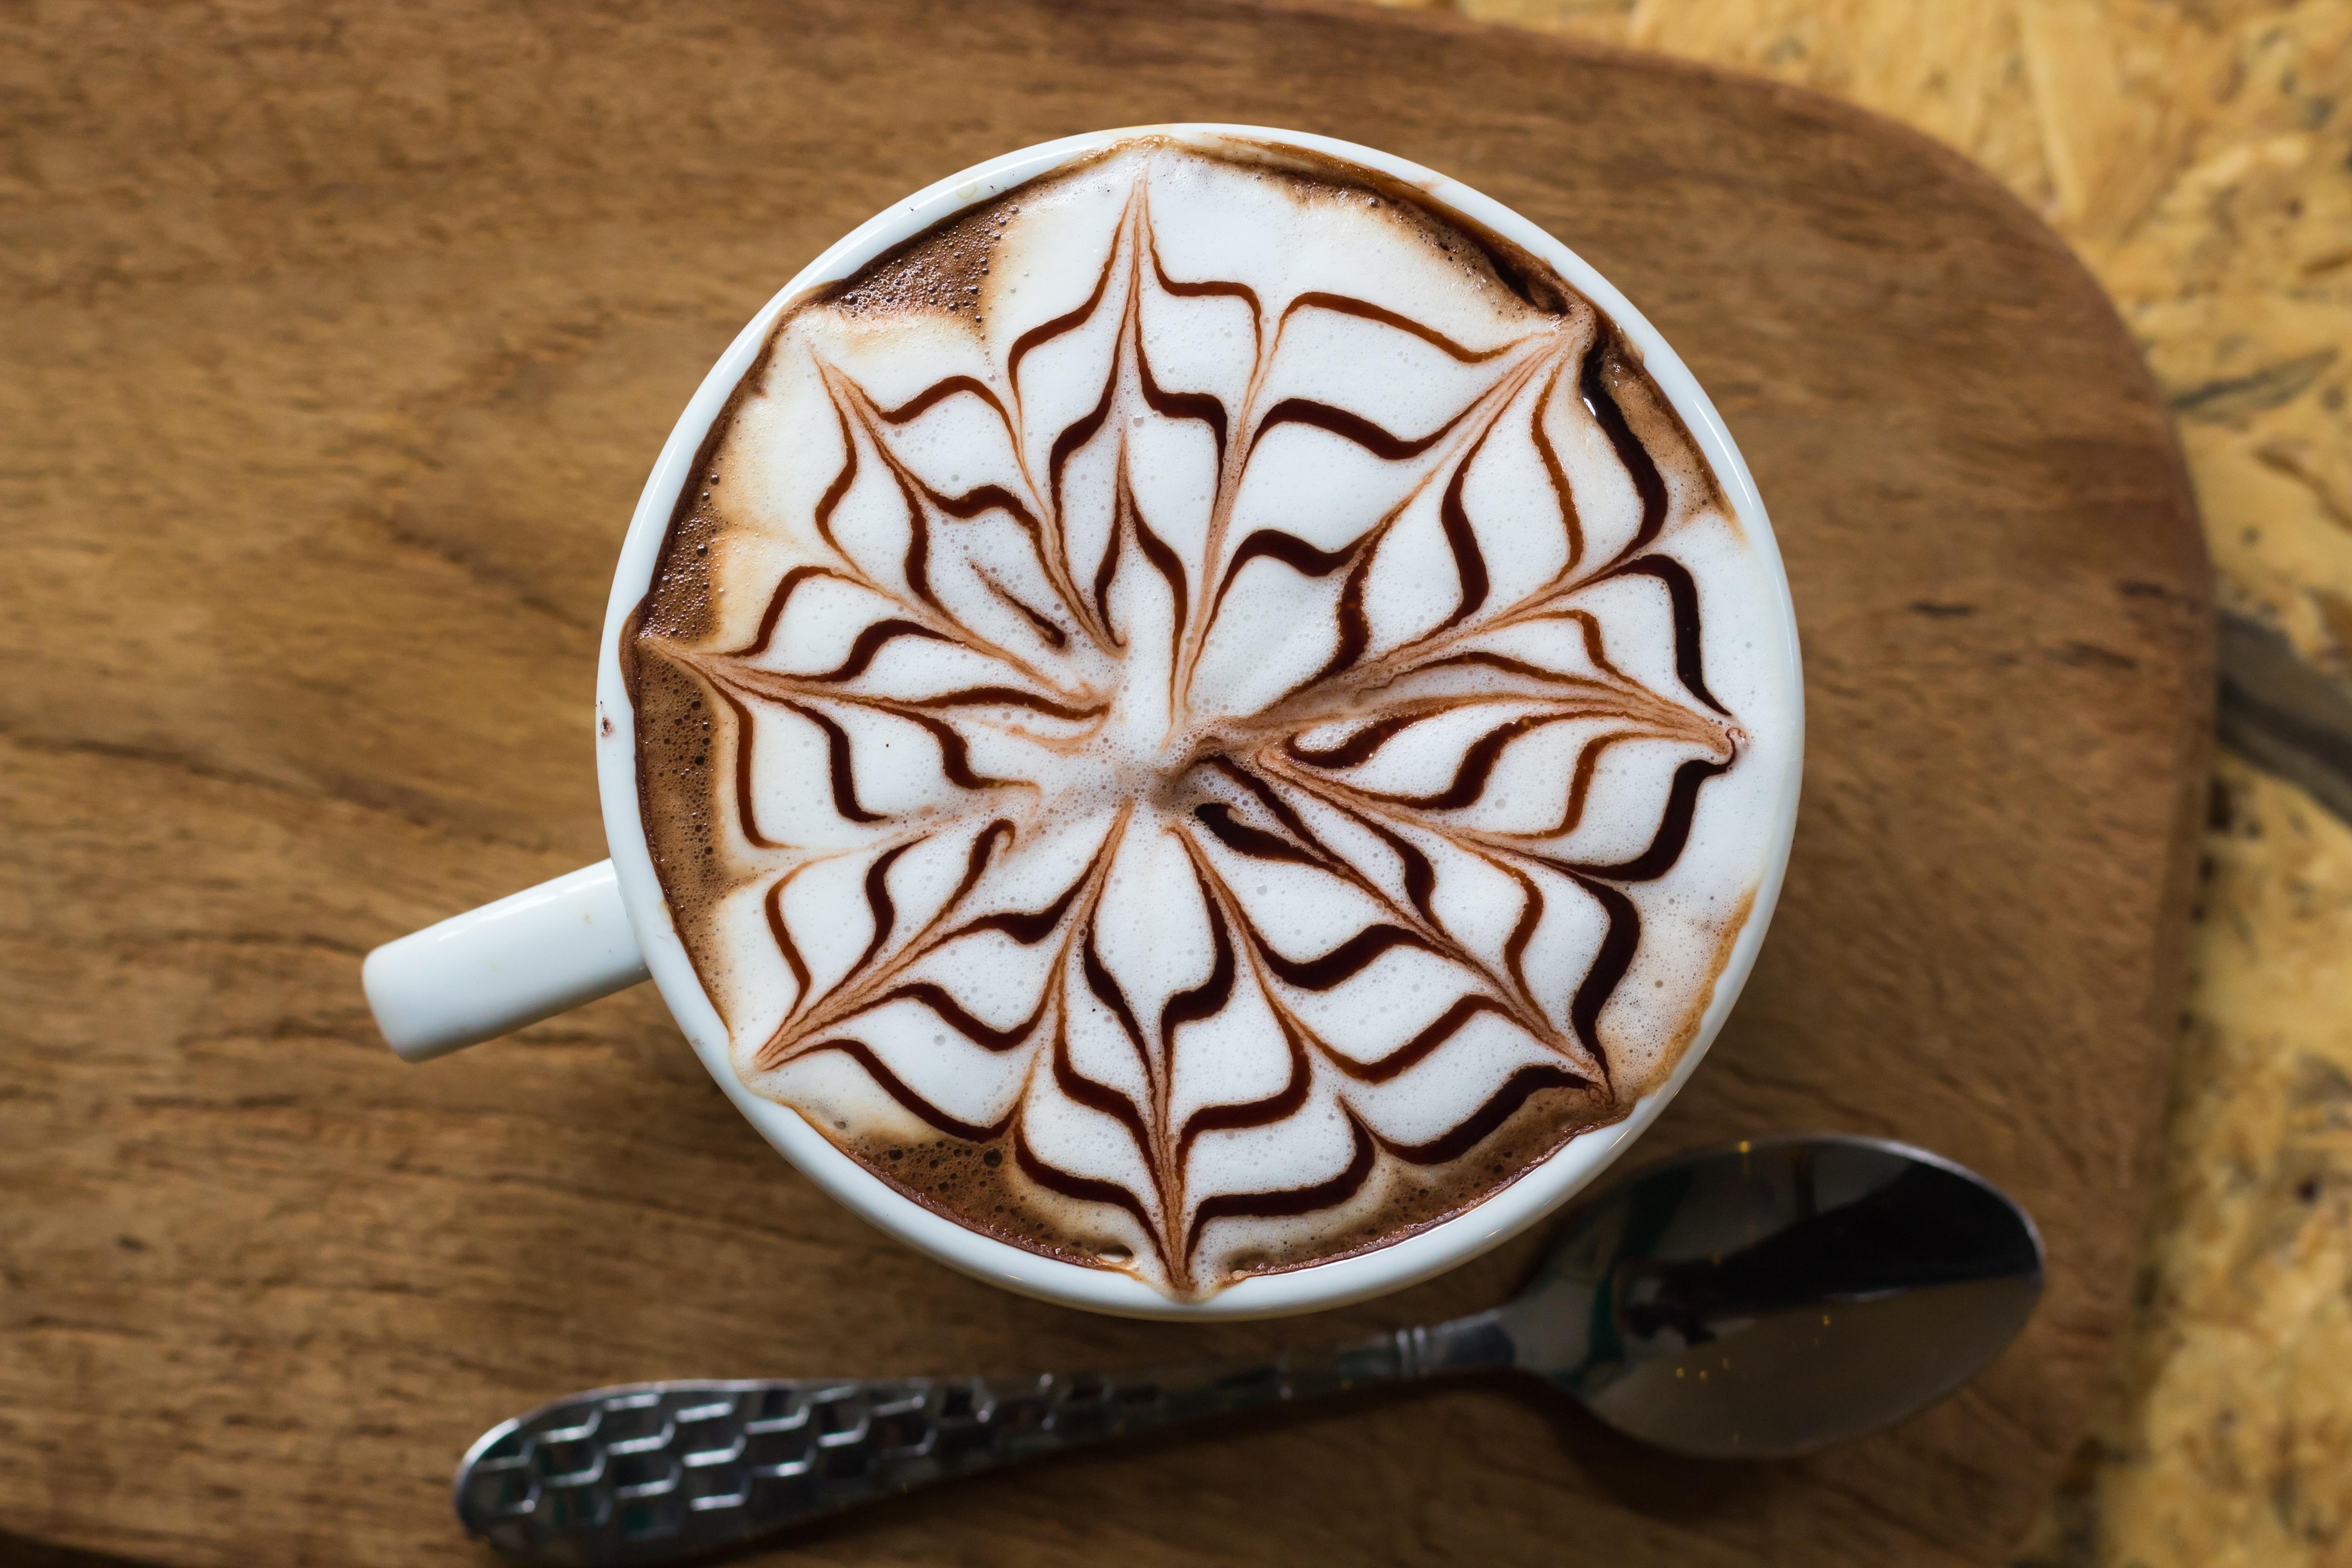 Gambar manis cappuccino pola makanan bersantai minuman minum gambar manis cappuccino pola makanan bersantai minuman minum susu cangkir kopi lezat tersenyum gelembung pagi pagi seni senang liburan thecheapjerseys Gallery